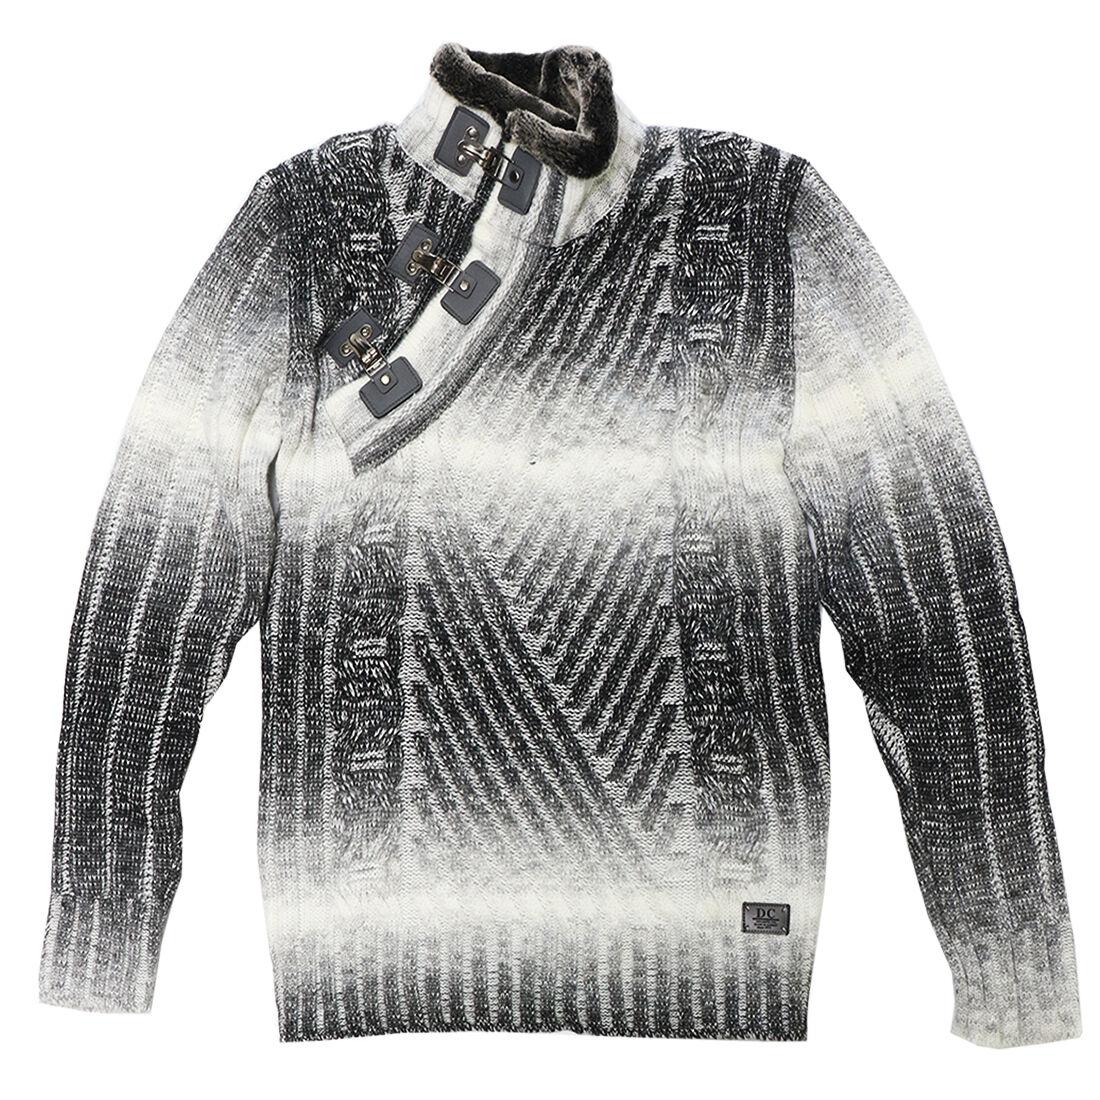 NEW DECAPRIO USA MEN LUXURY SWEATER DESIGNER CLOTHS CCT0516K811